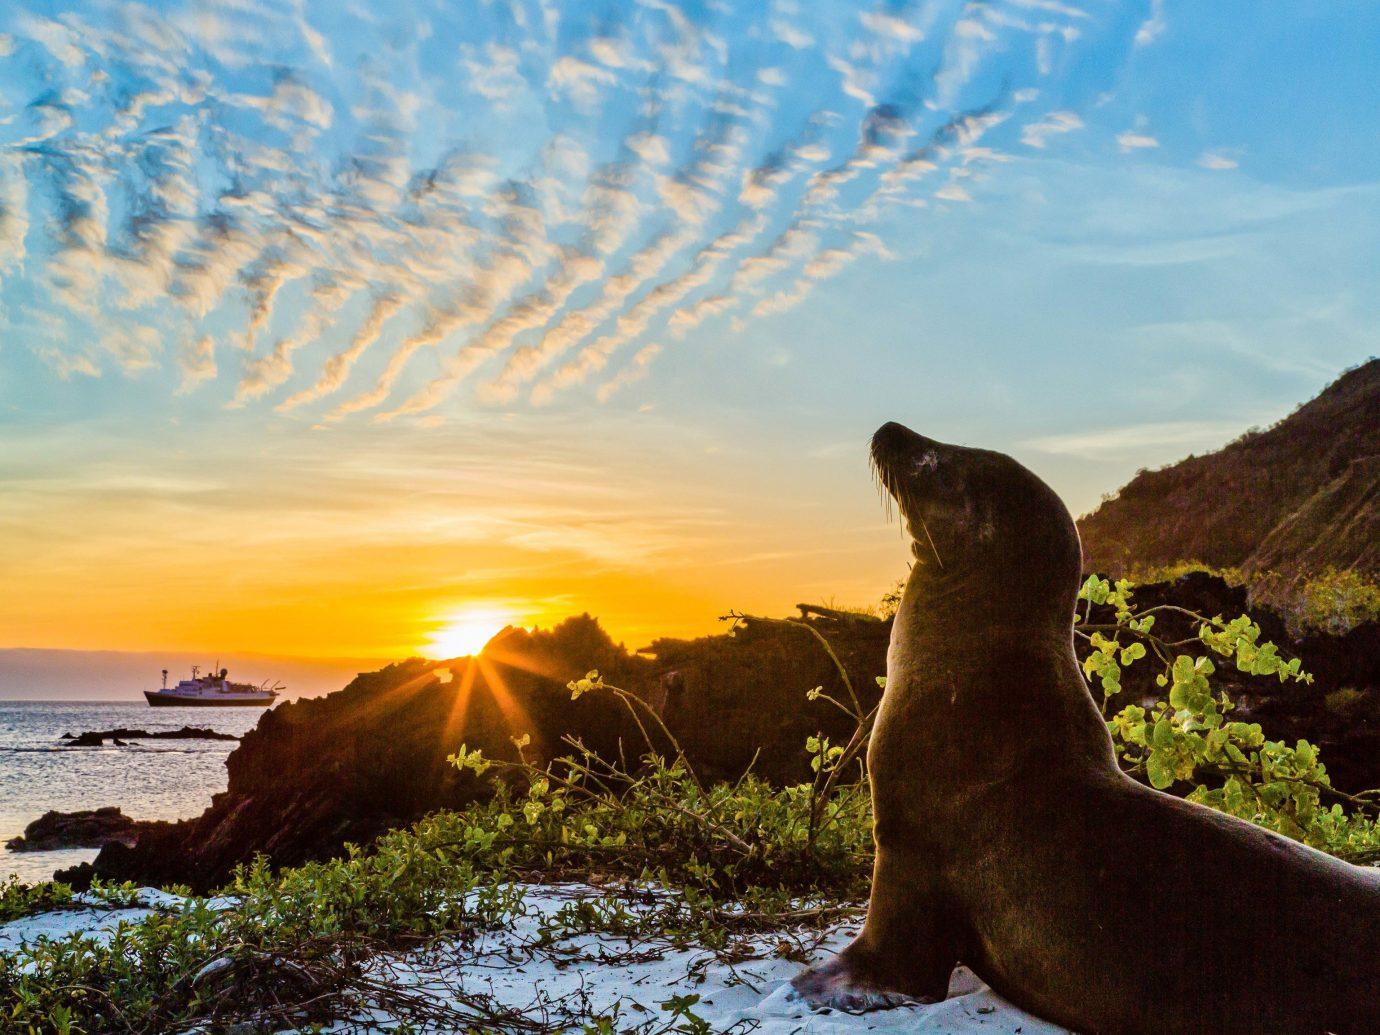 sky shore seals Sea rock Coast Wildlife Beach sunlight Ocean grass promontory marine mammal wave cape cloud